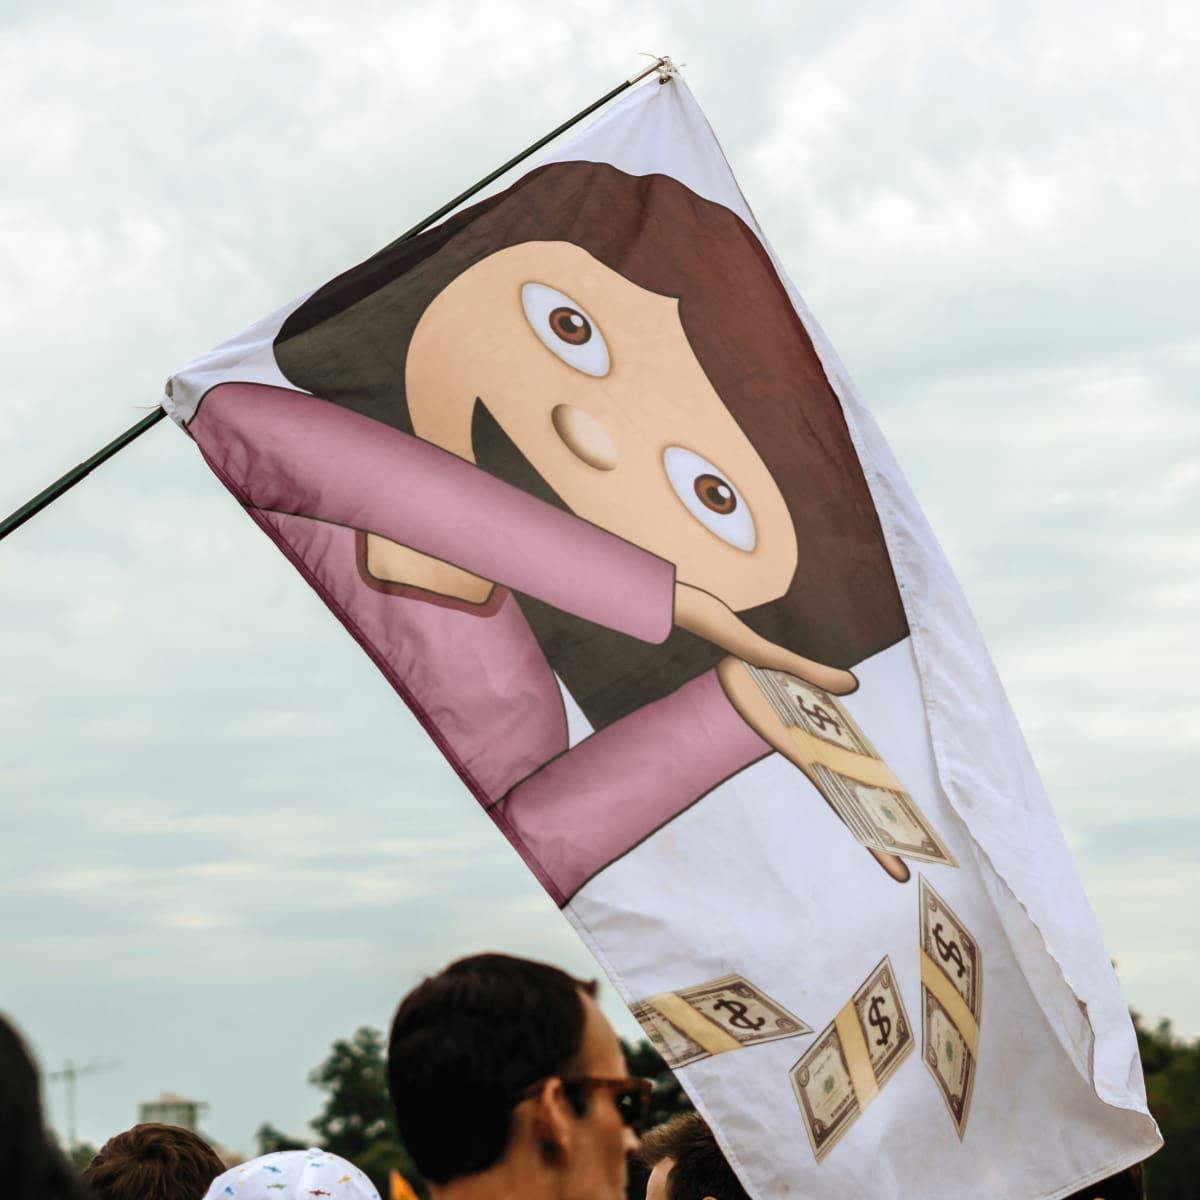 ACL Austin City Limits Music Festival 2016 flags emoji